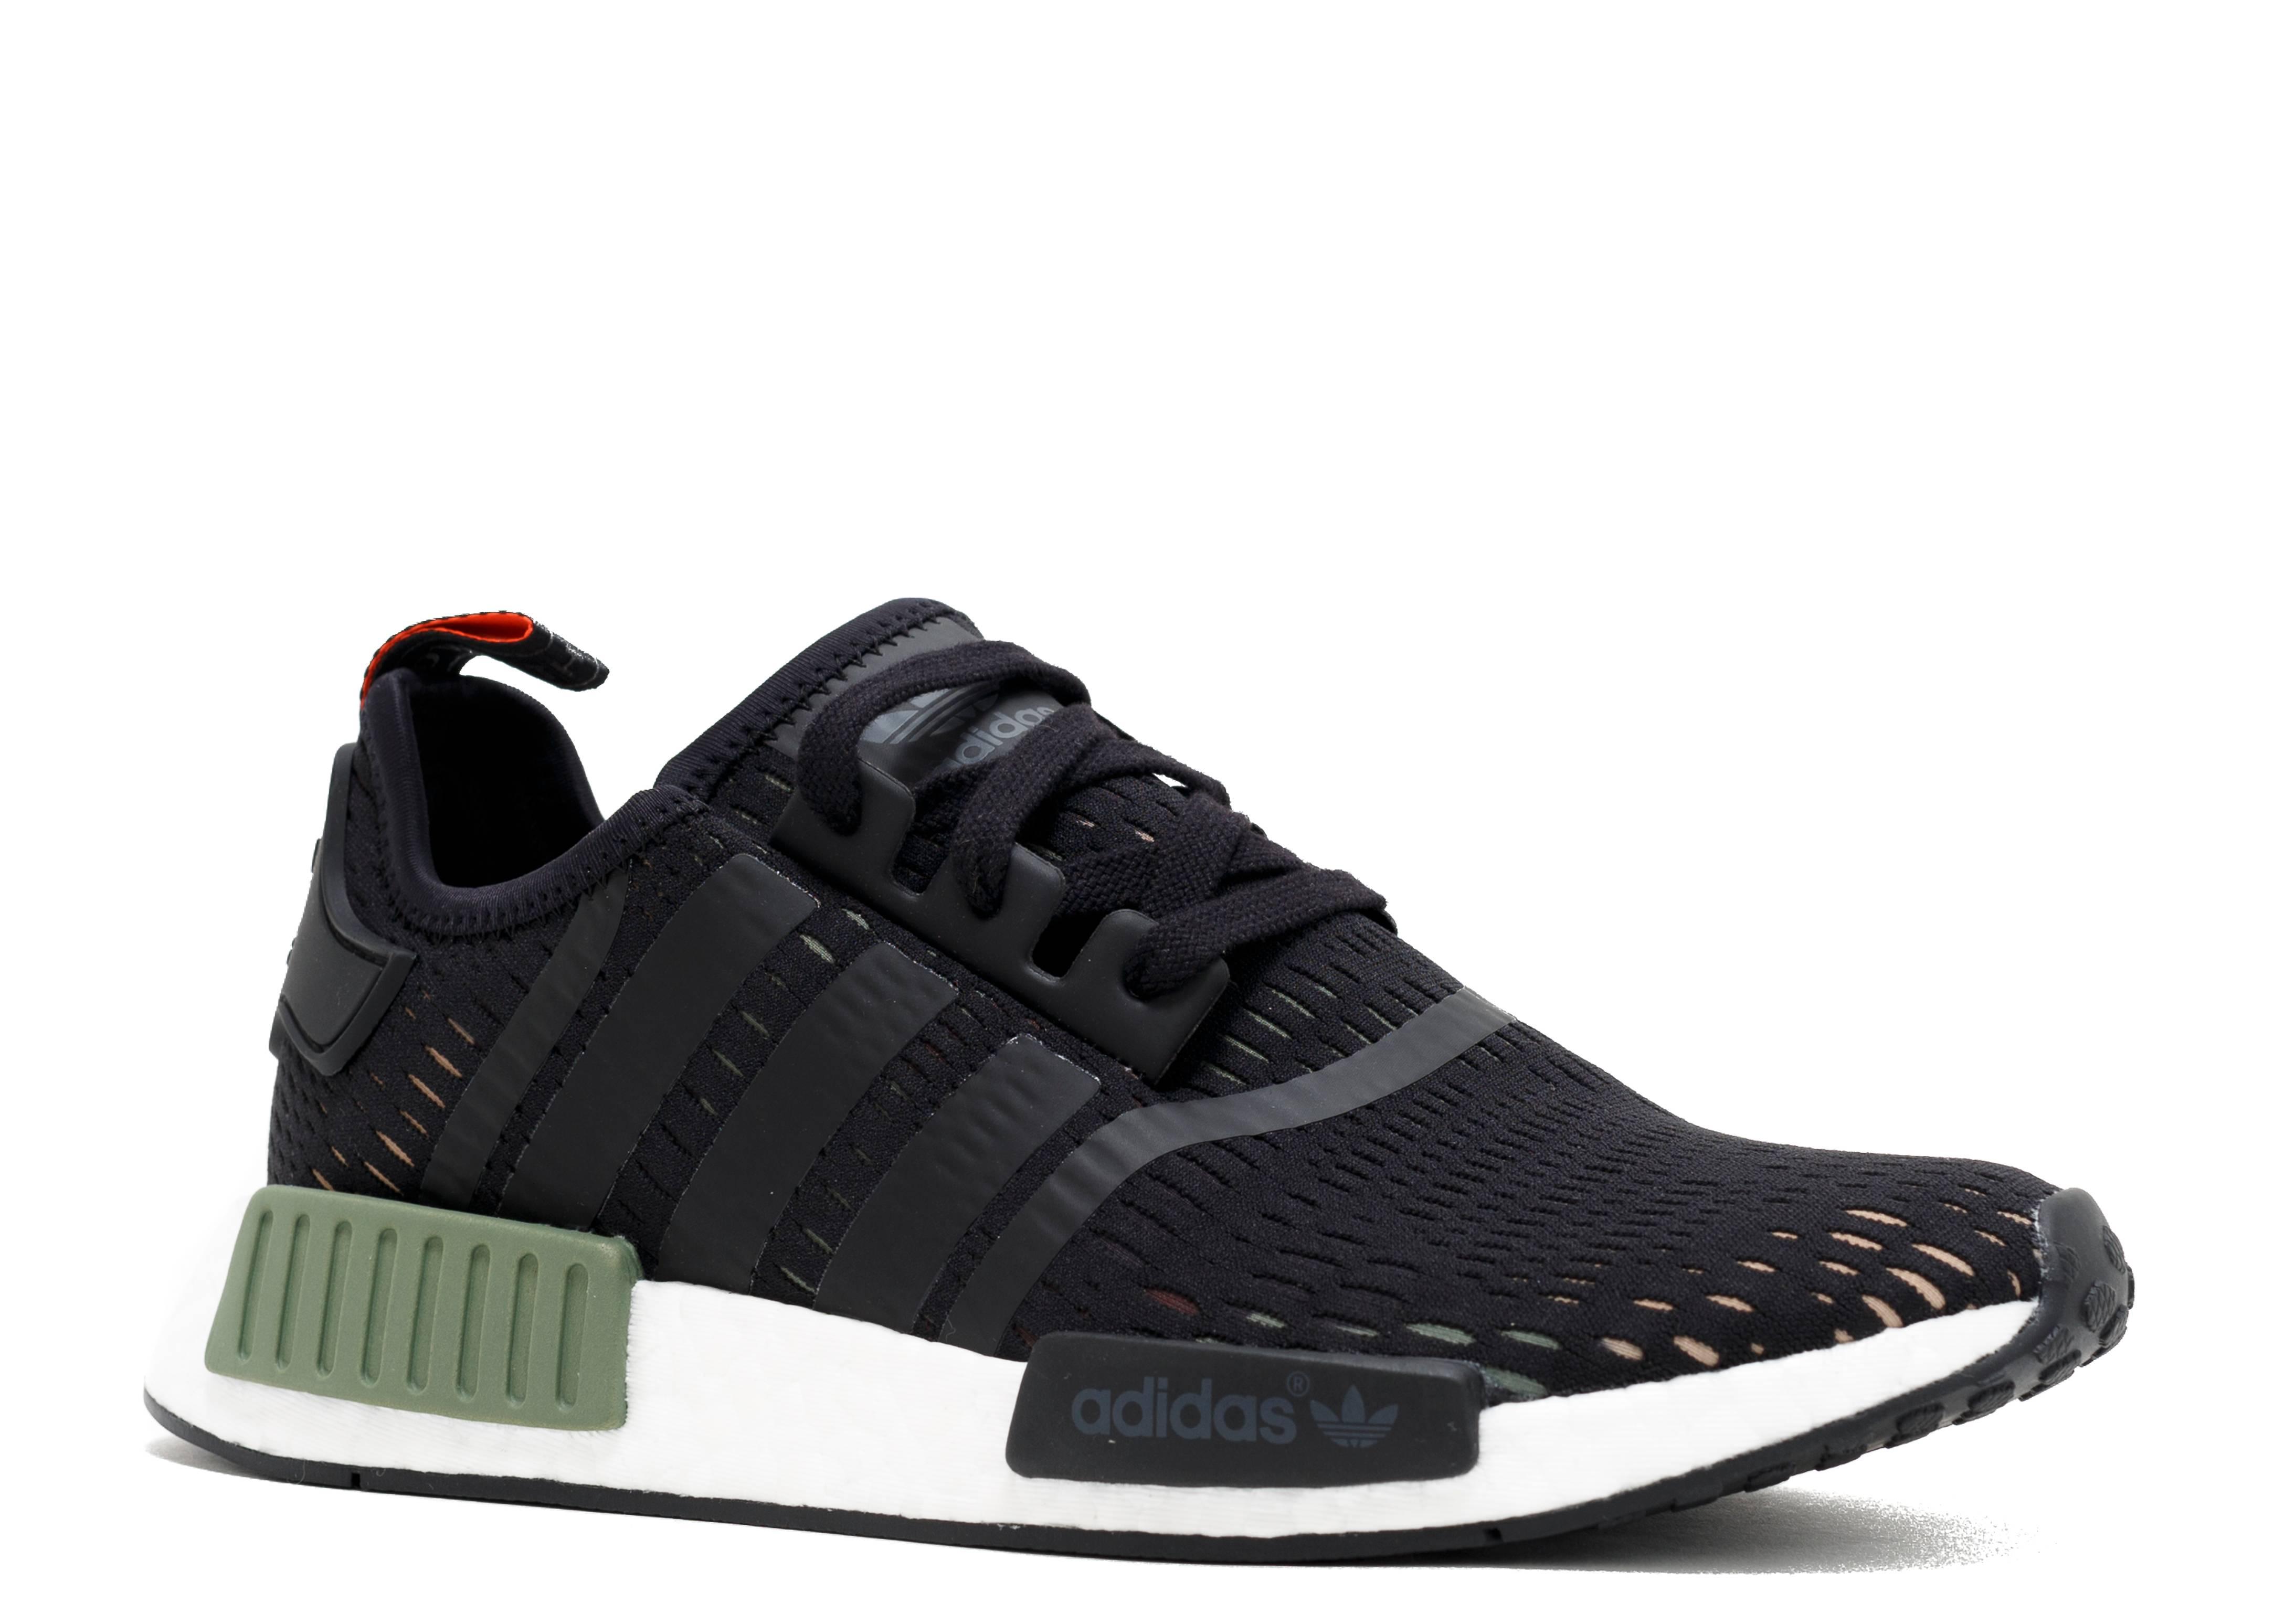 adidas nmd dark green